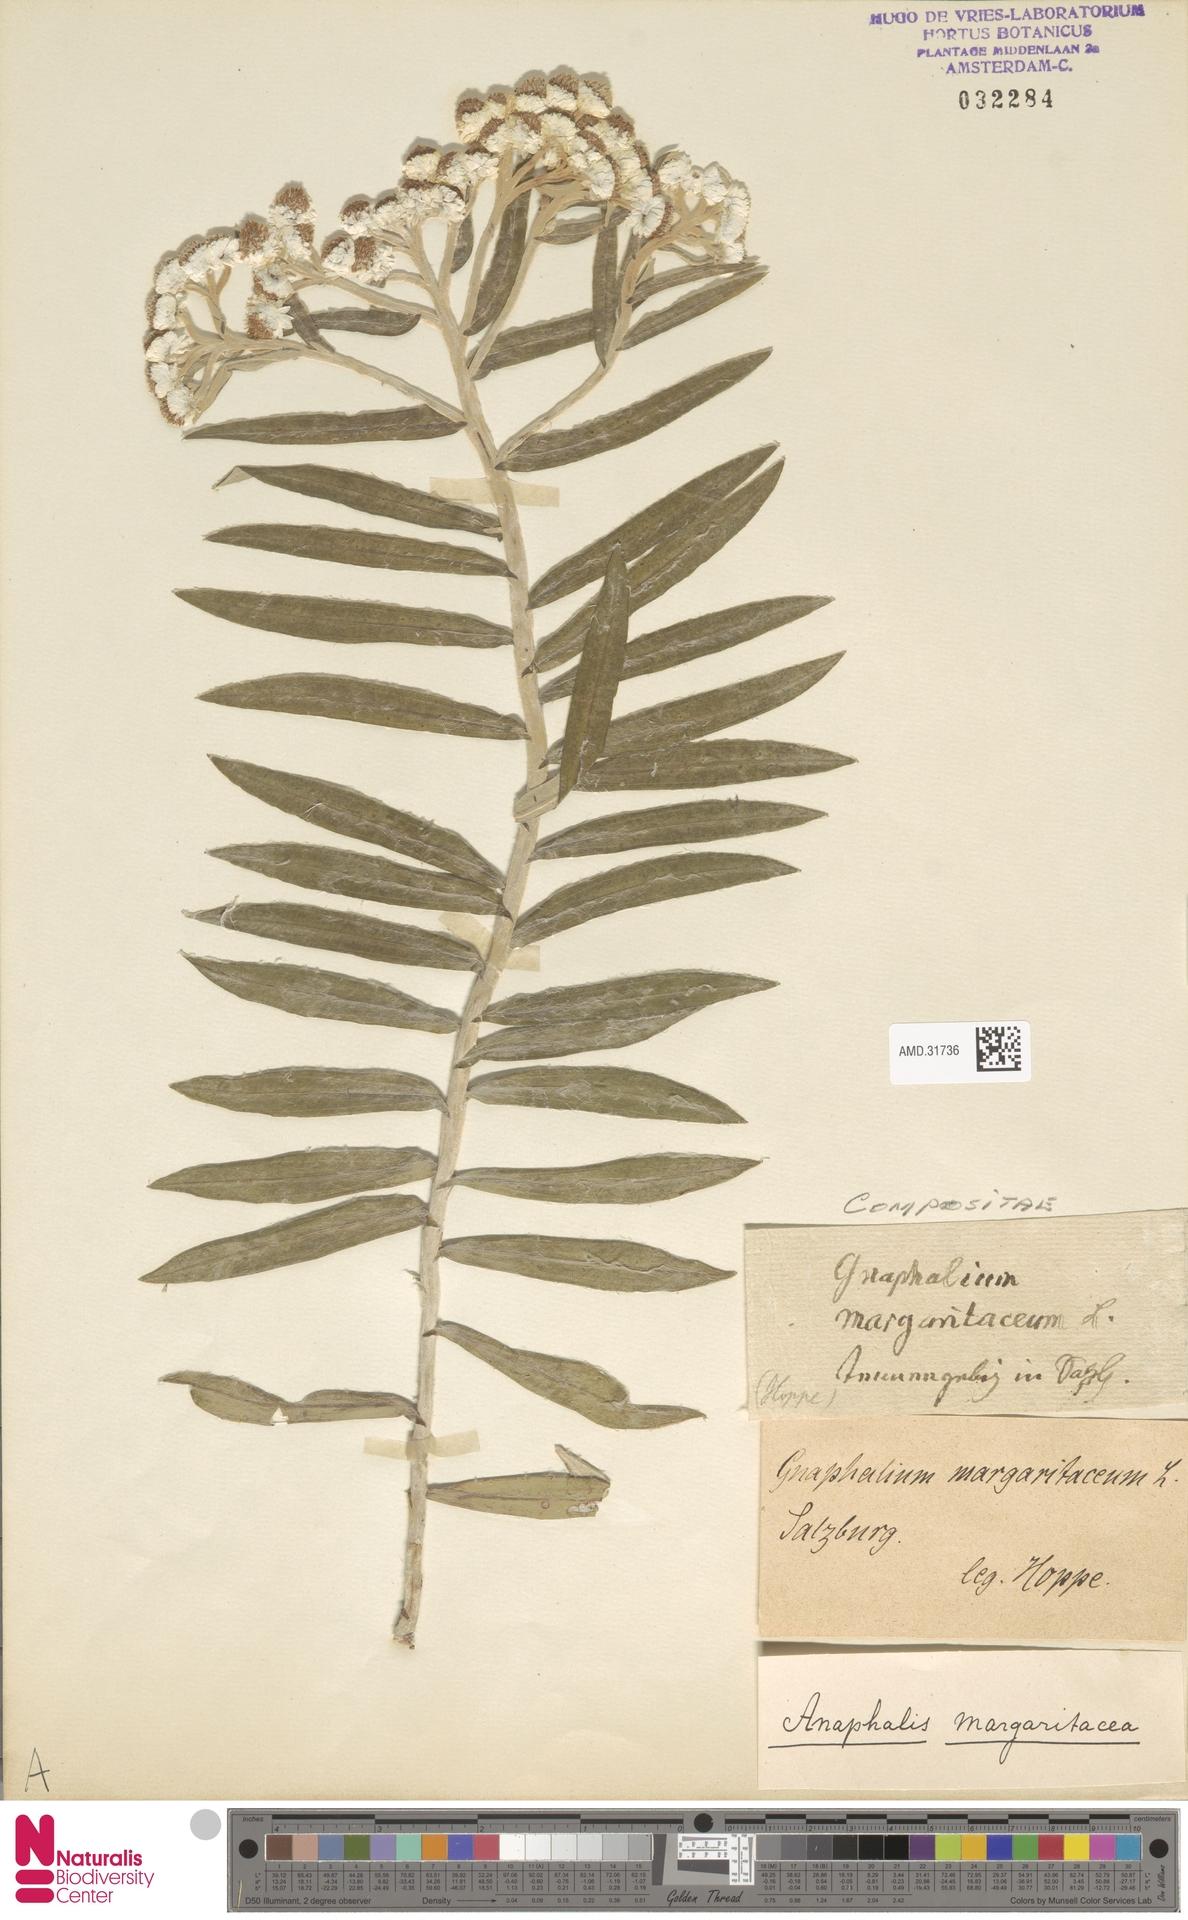 AMD.31736 | Anaphalis margaritacea (L.) Benth. & Hook.f.